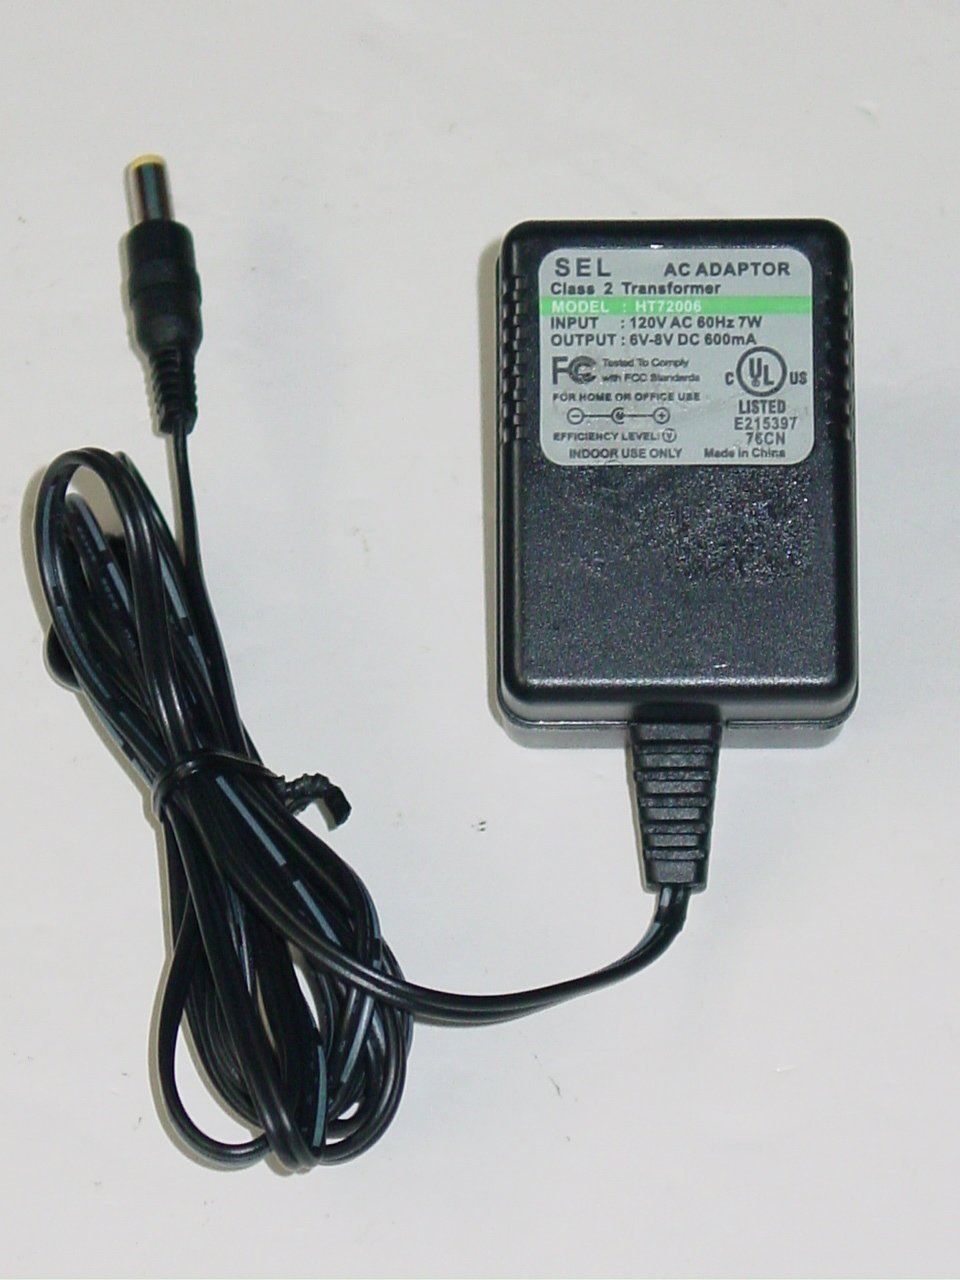 SEL HT72006 Charger AC Adapter 6V 8V 600mA for Stanley Spotlight SL500HL